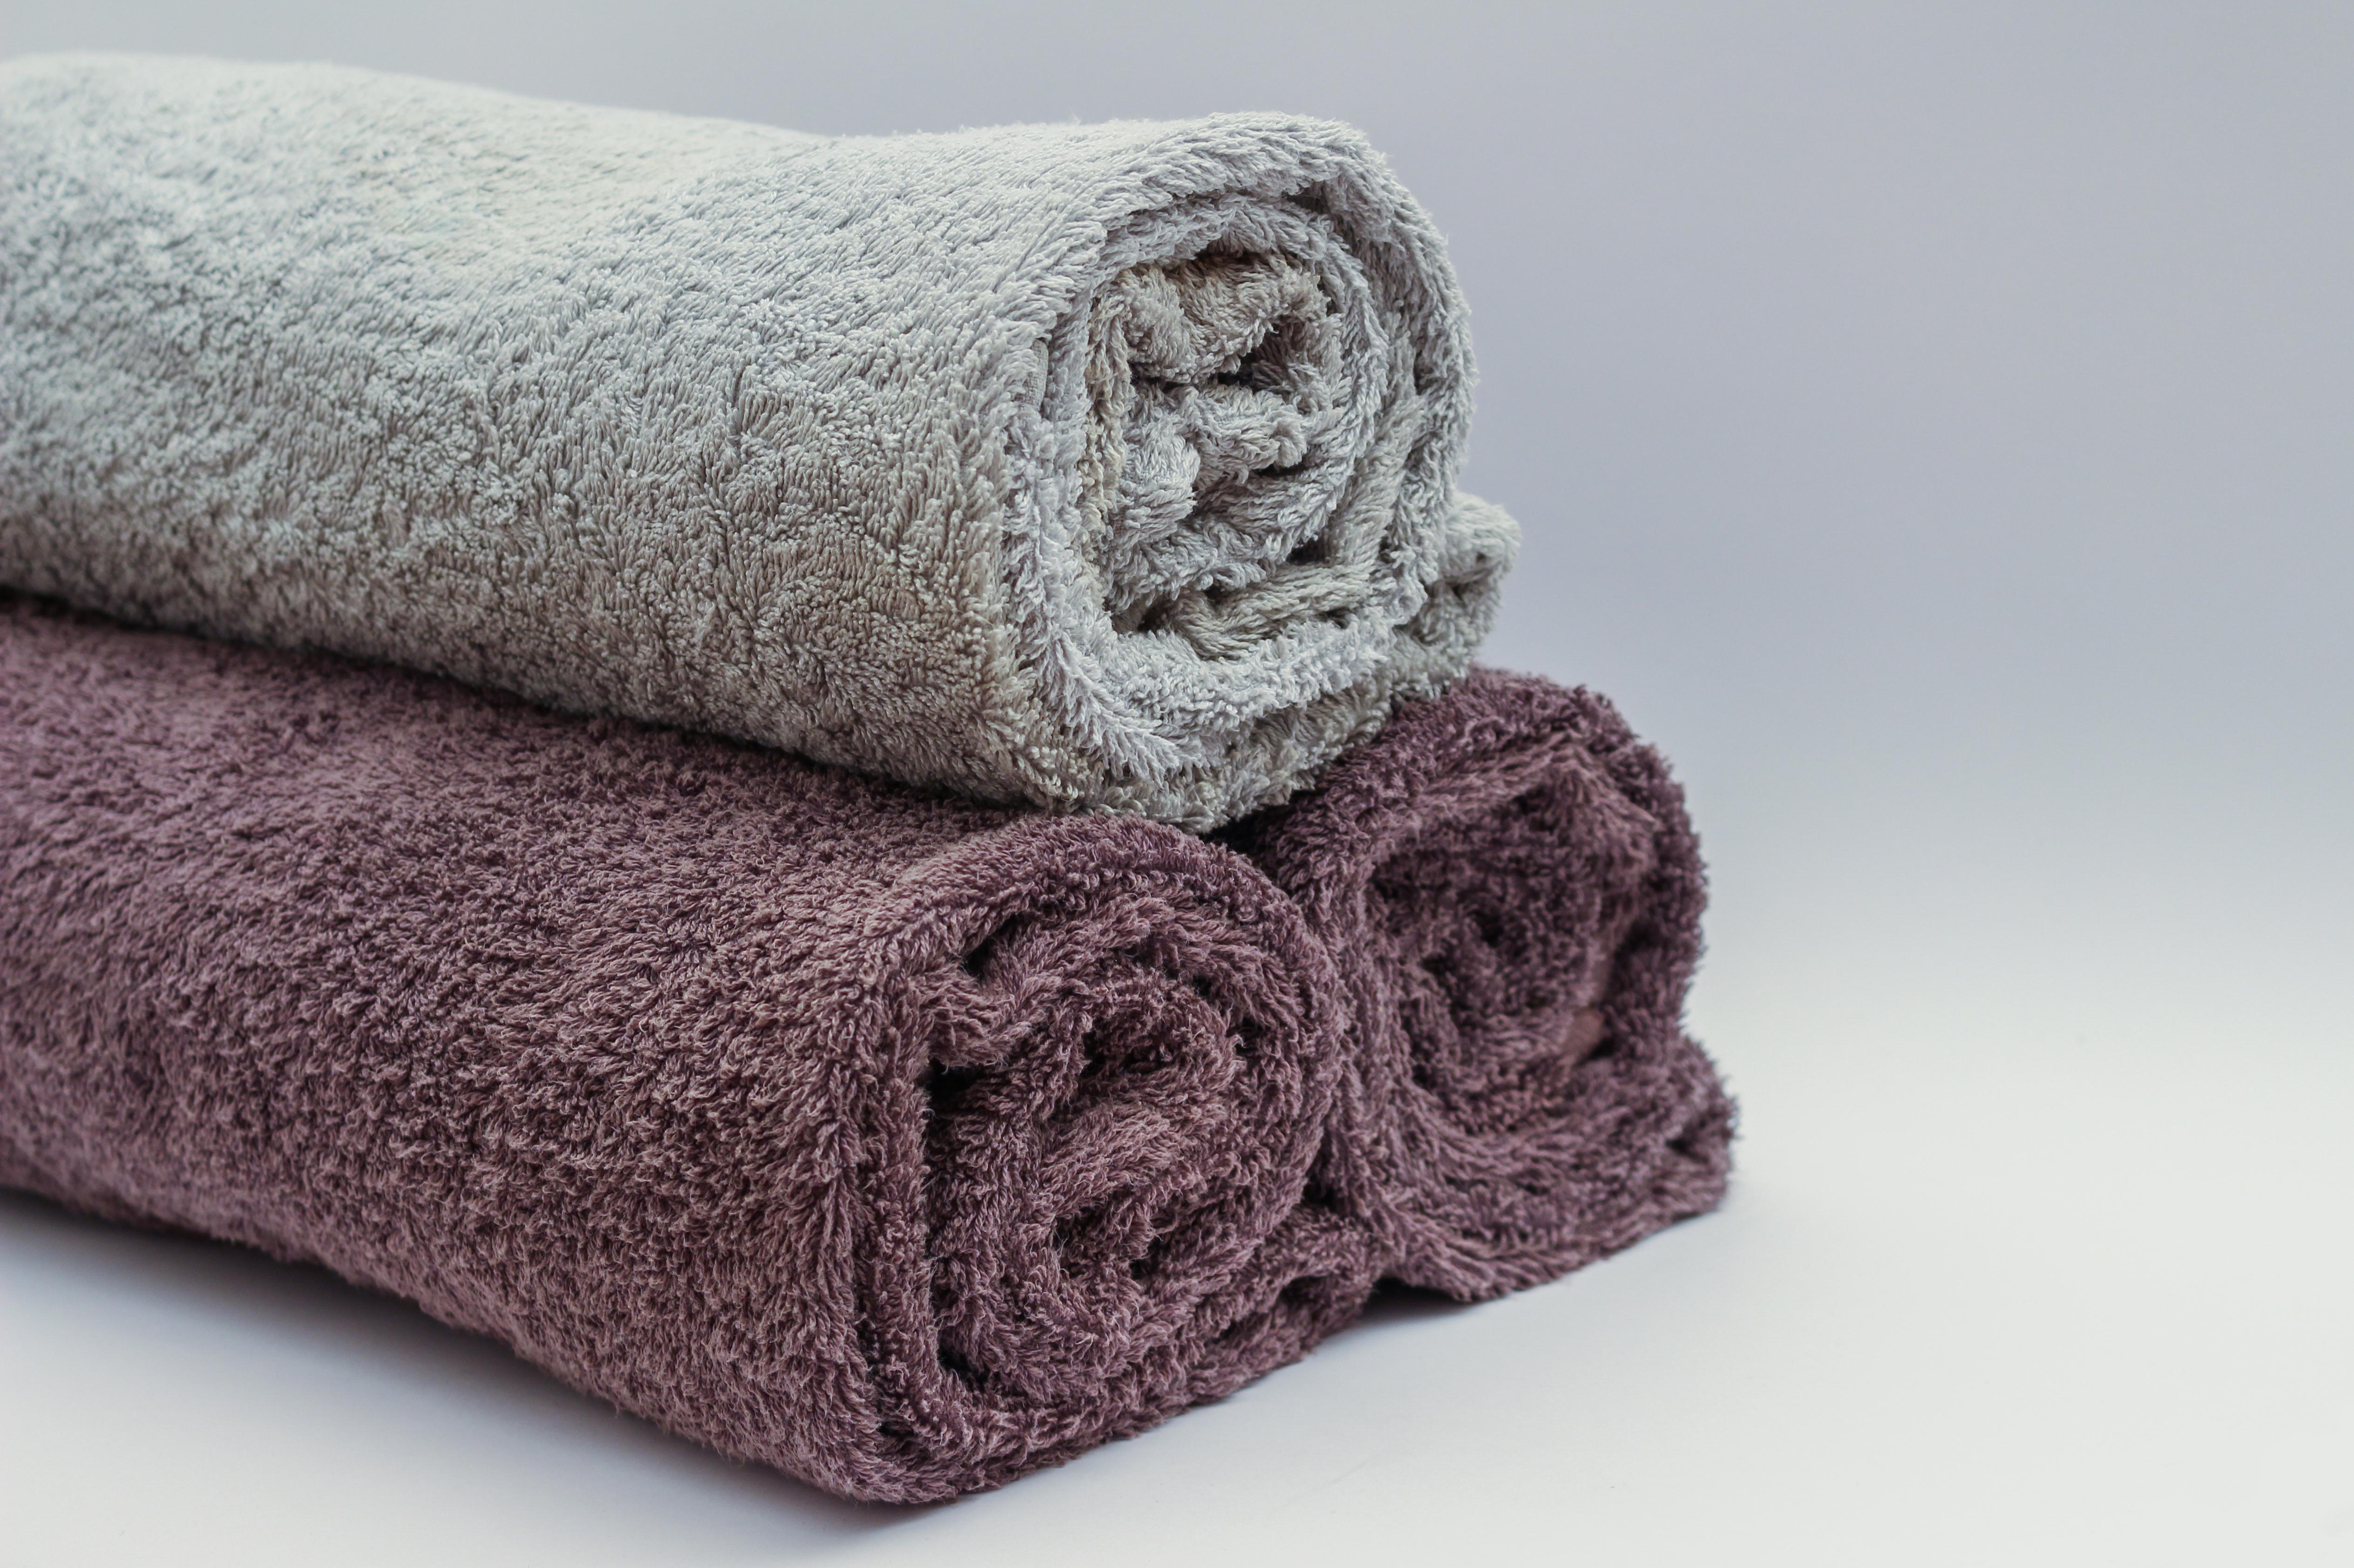 Free Images Pattern Wool Material Towel Bathroom Textile Art